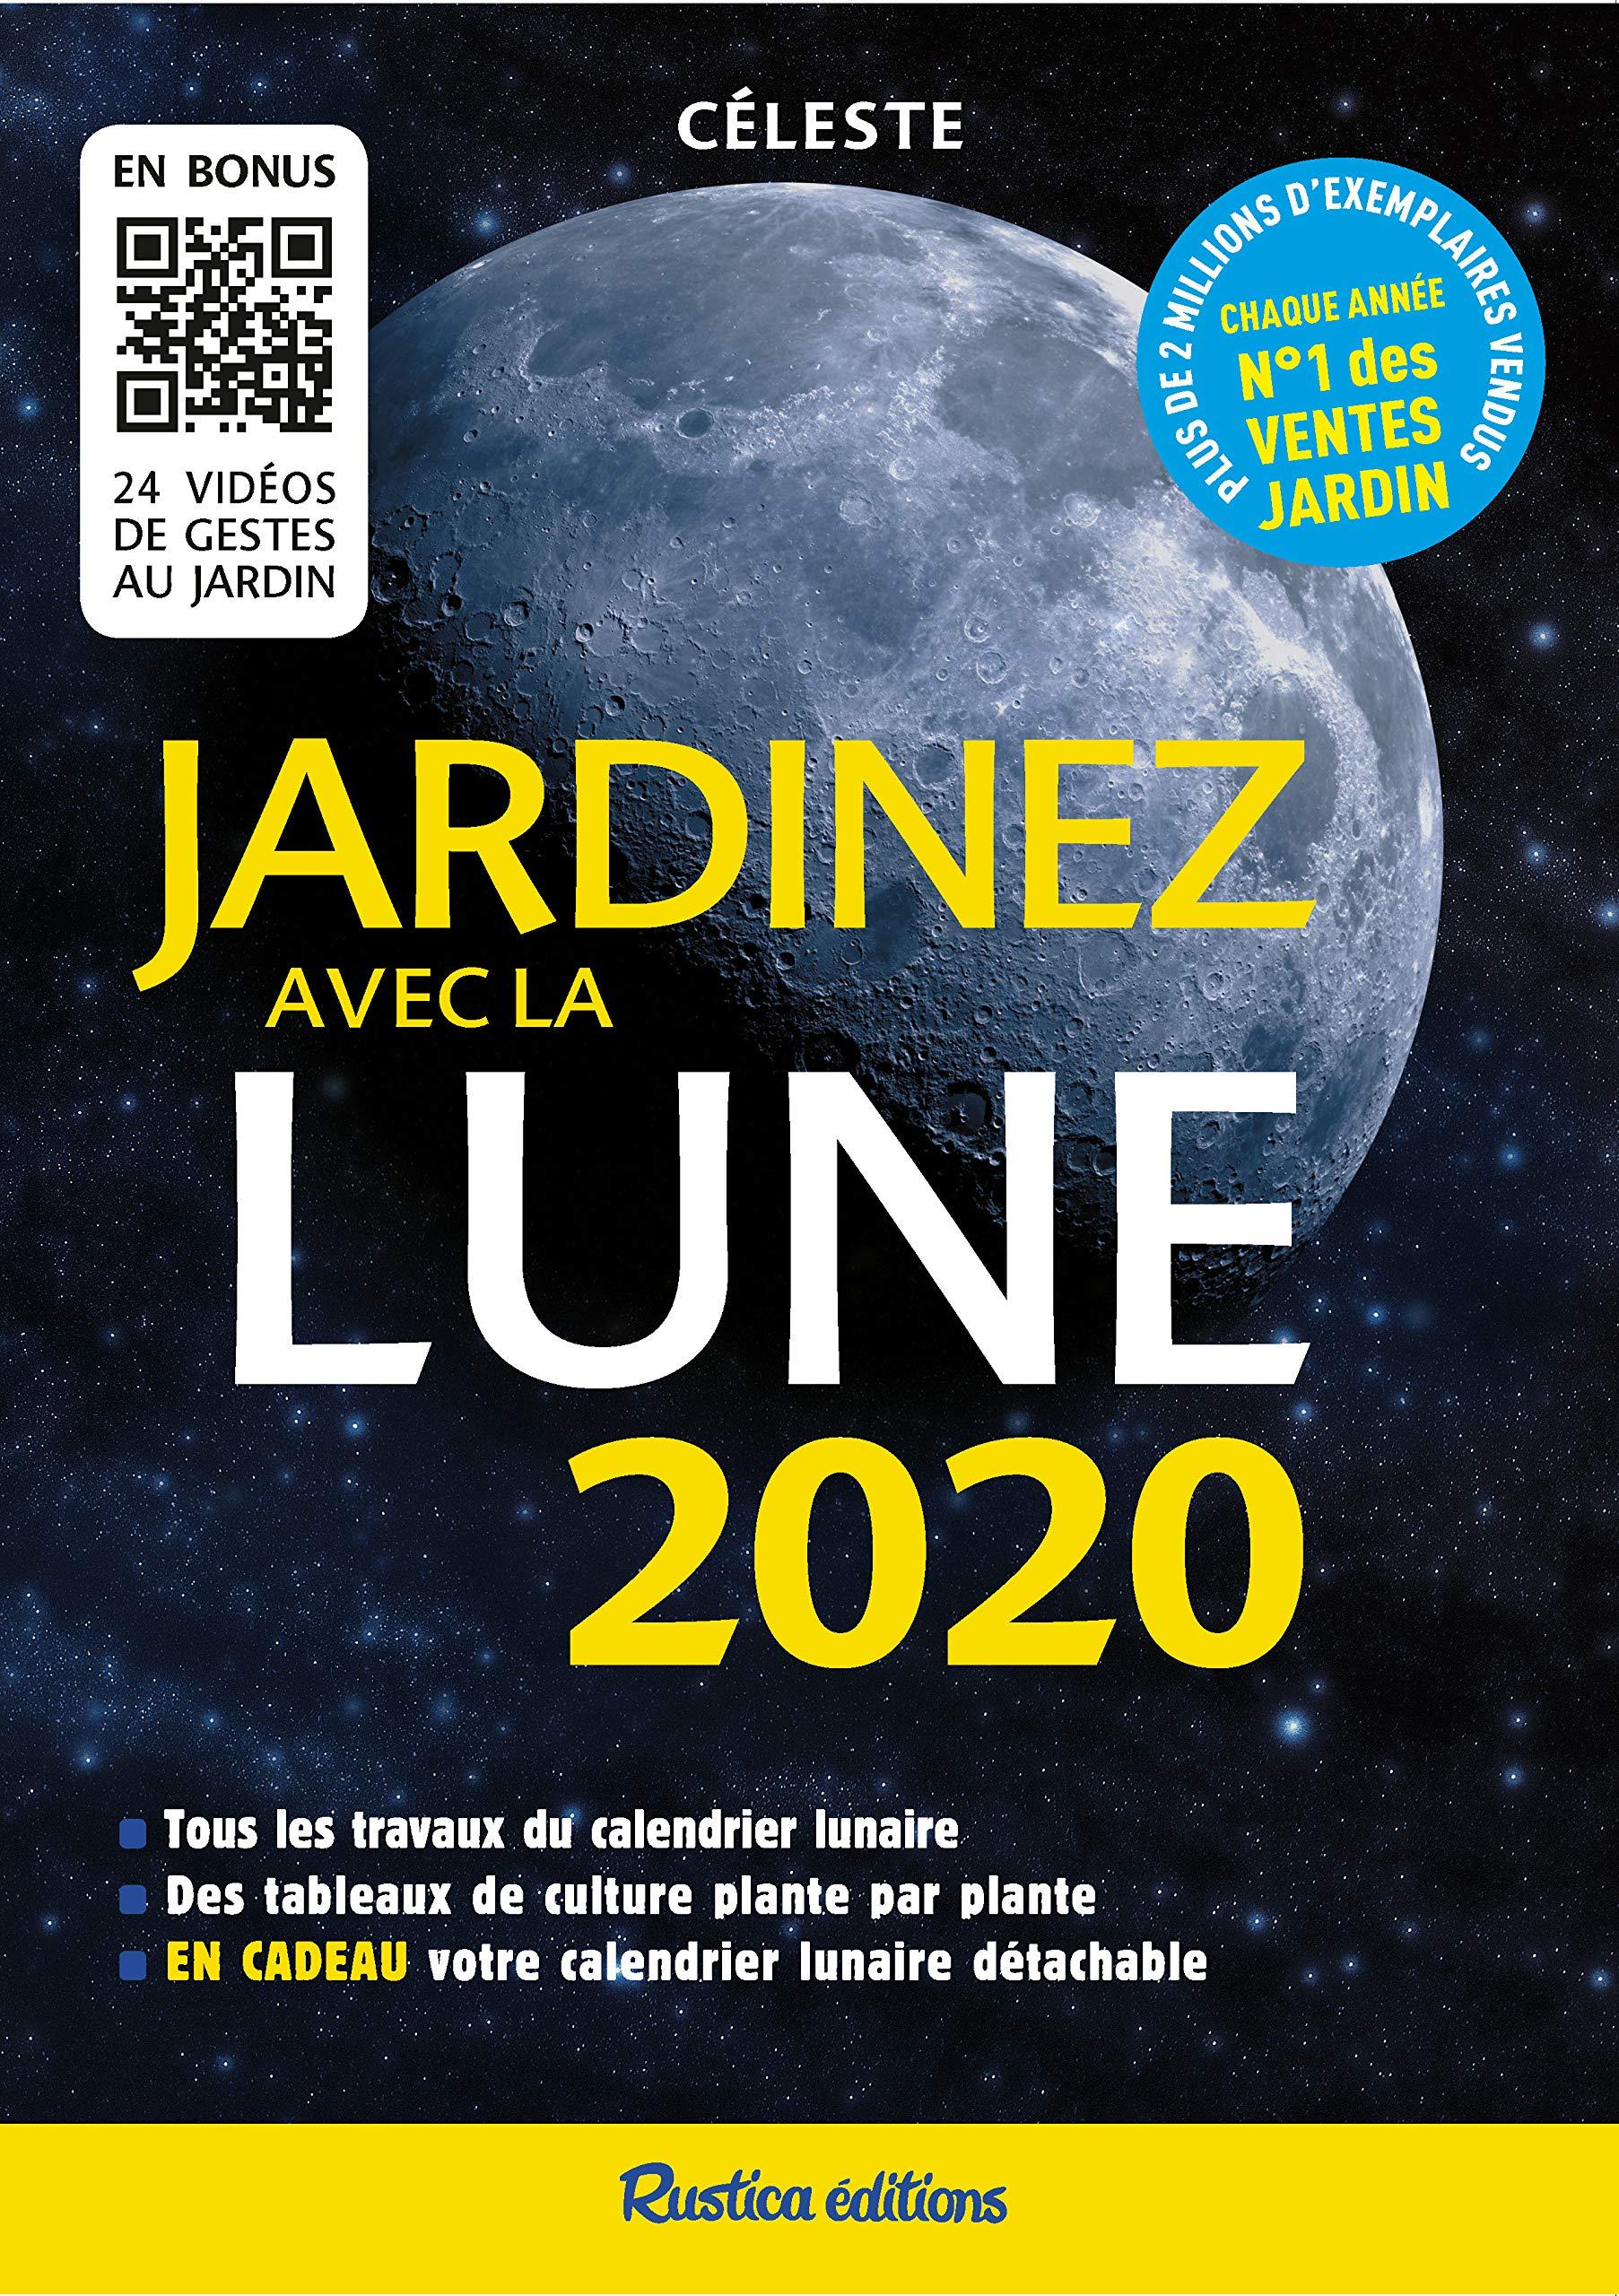 Rustica Calendrier Lunaire Mai 2021 Amazon.fr   Jardinez avec la Lune   Marin, Michel, Frances